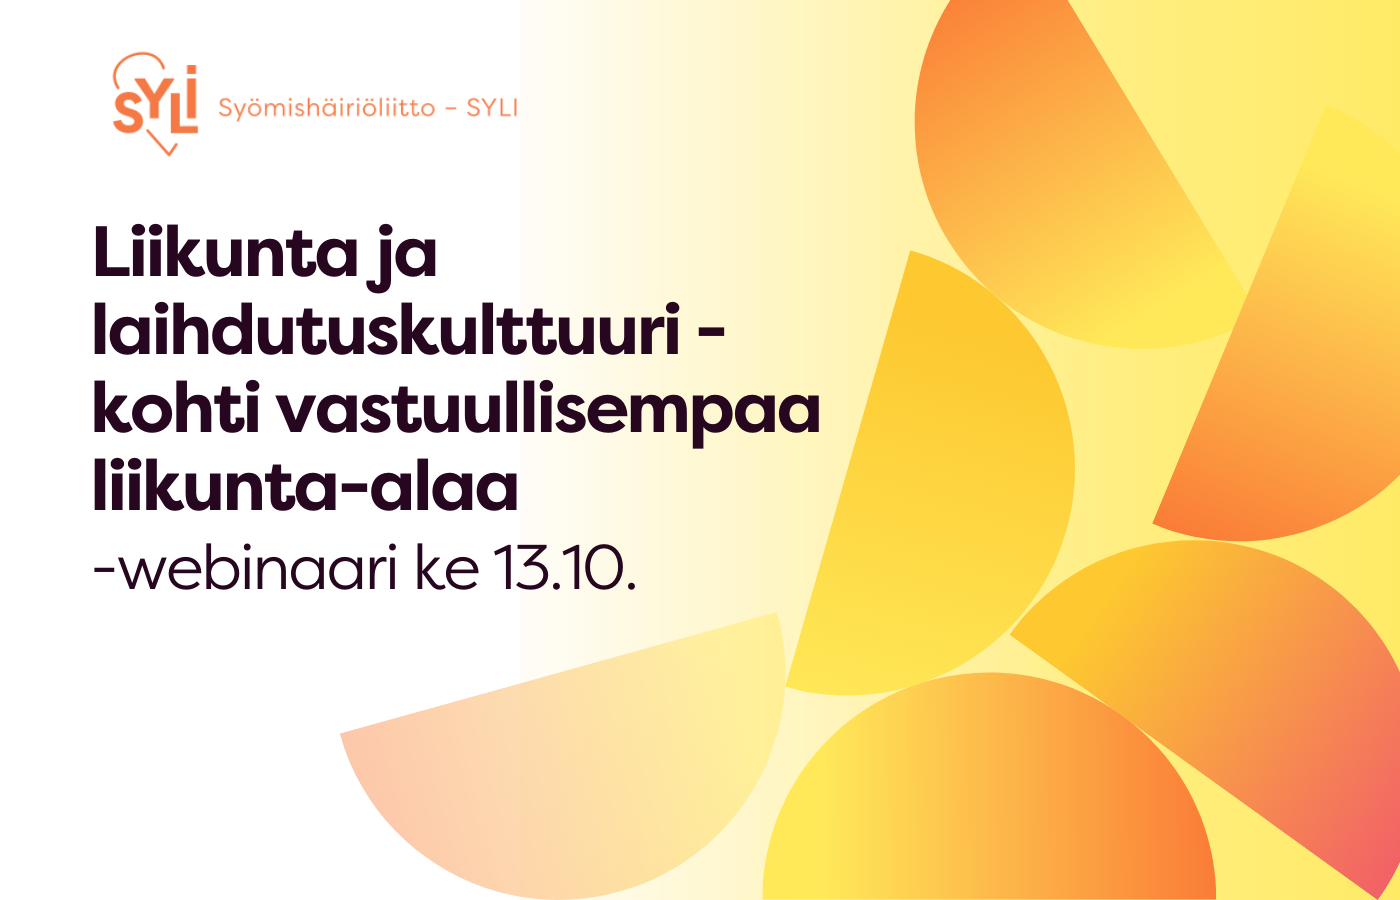 Kuvassa oranssinkirjavalla taustalla teksti: Liikunta ja laihdutuskulttuuri - kohti vastuullisempaa liikunta-alaa -webinaari ke 13.10.